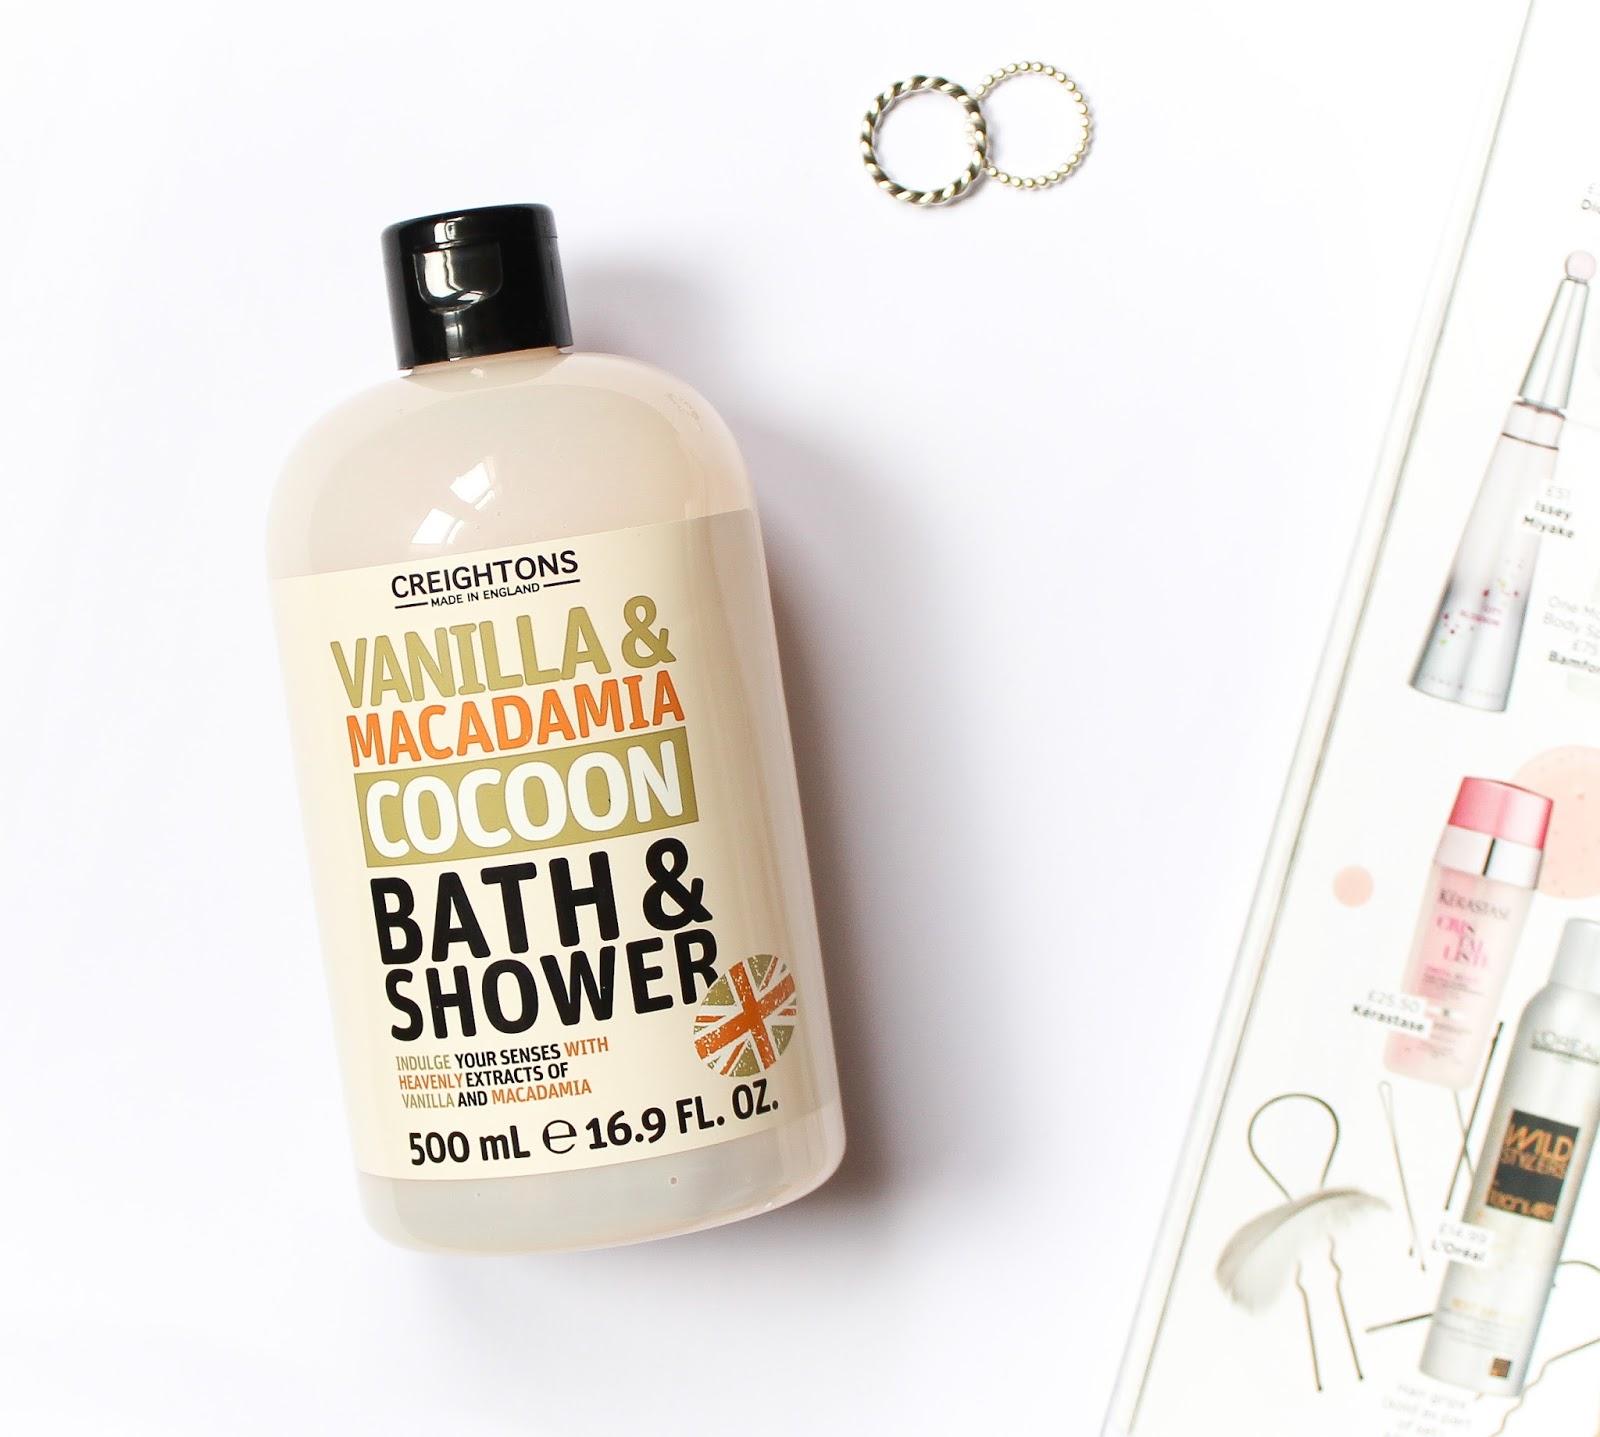 Creightons Vanilla Macadamia Bath & Shower Cream